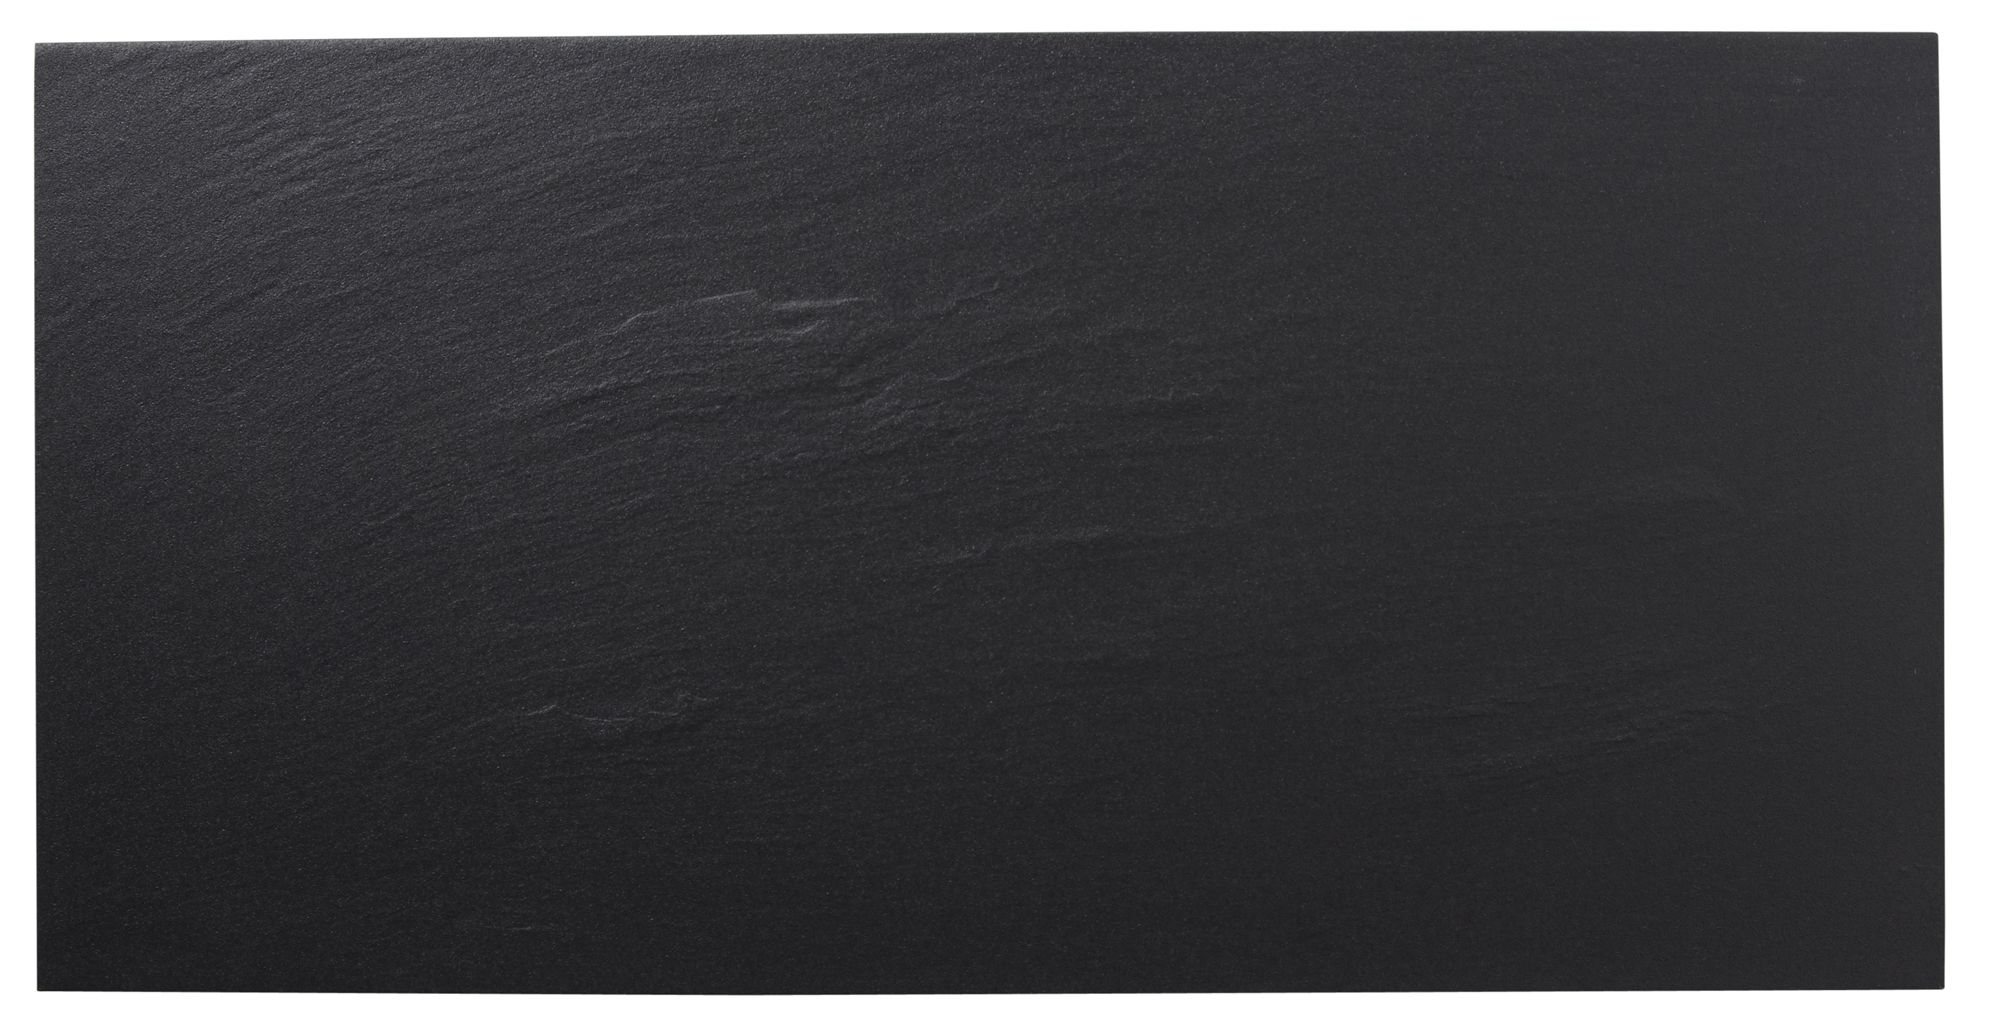 Black Slate Effect Porcelain Wall Amp Floor Tile Sample L